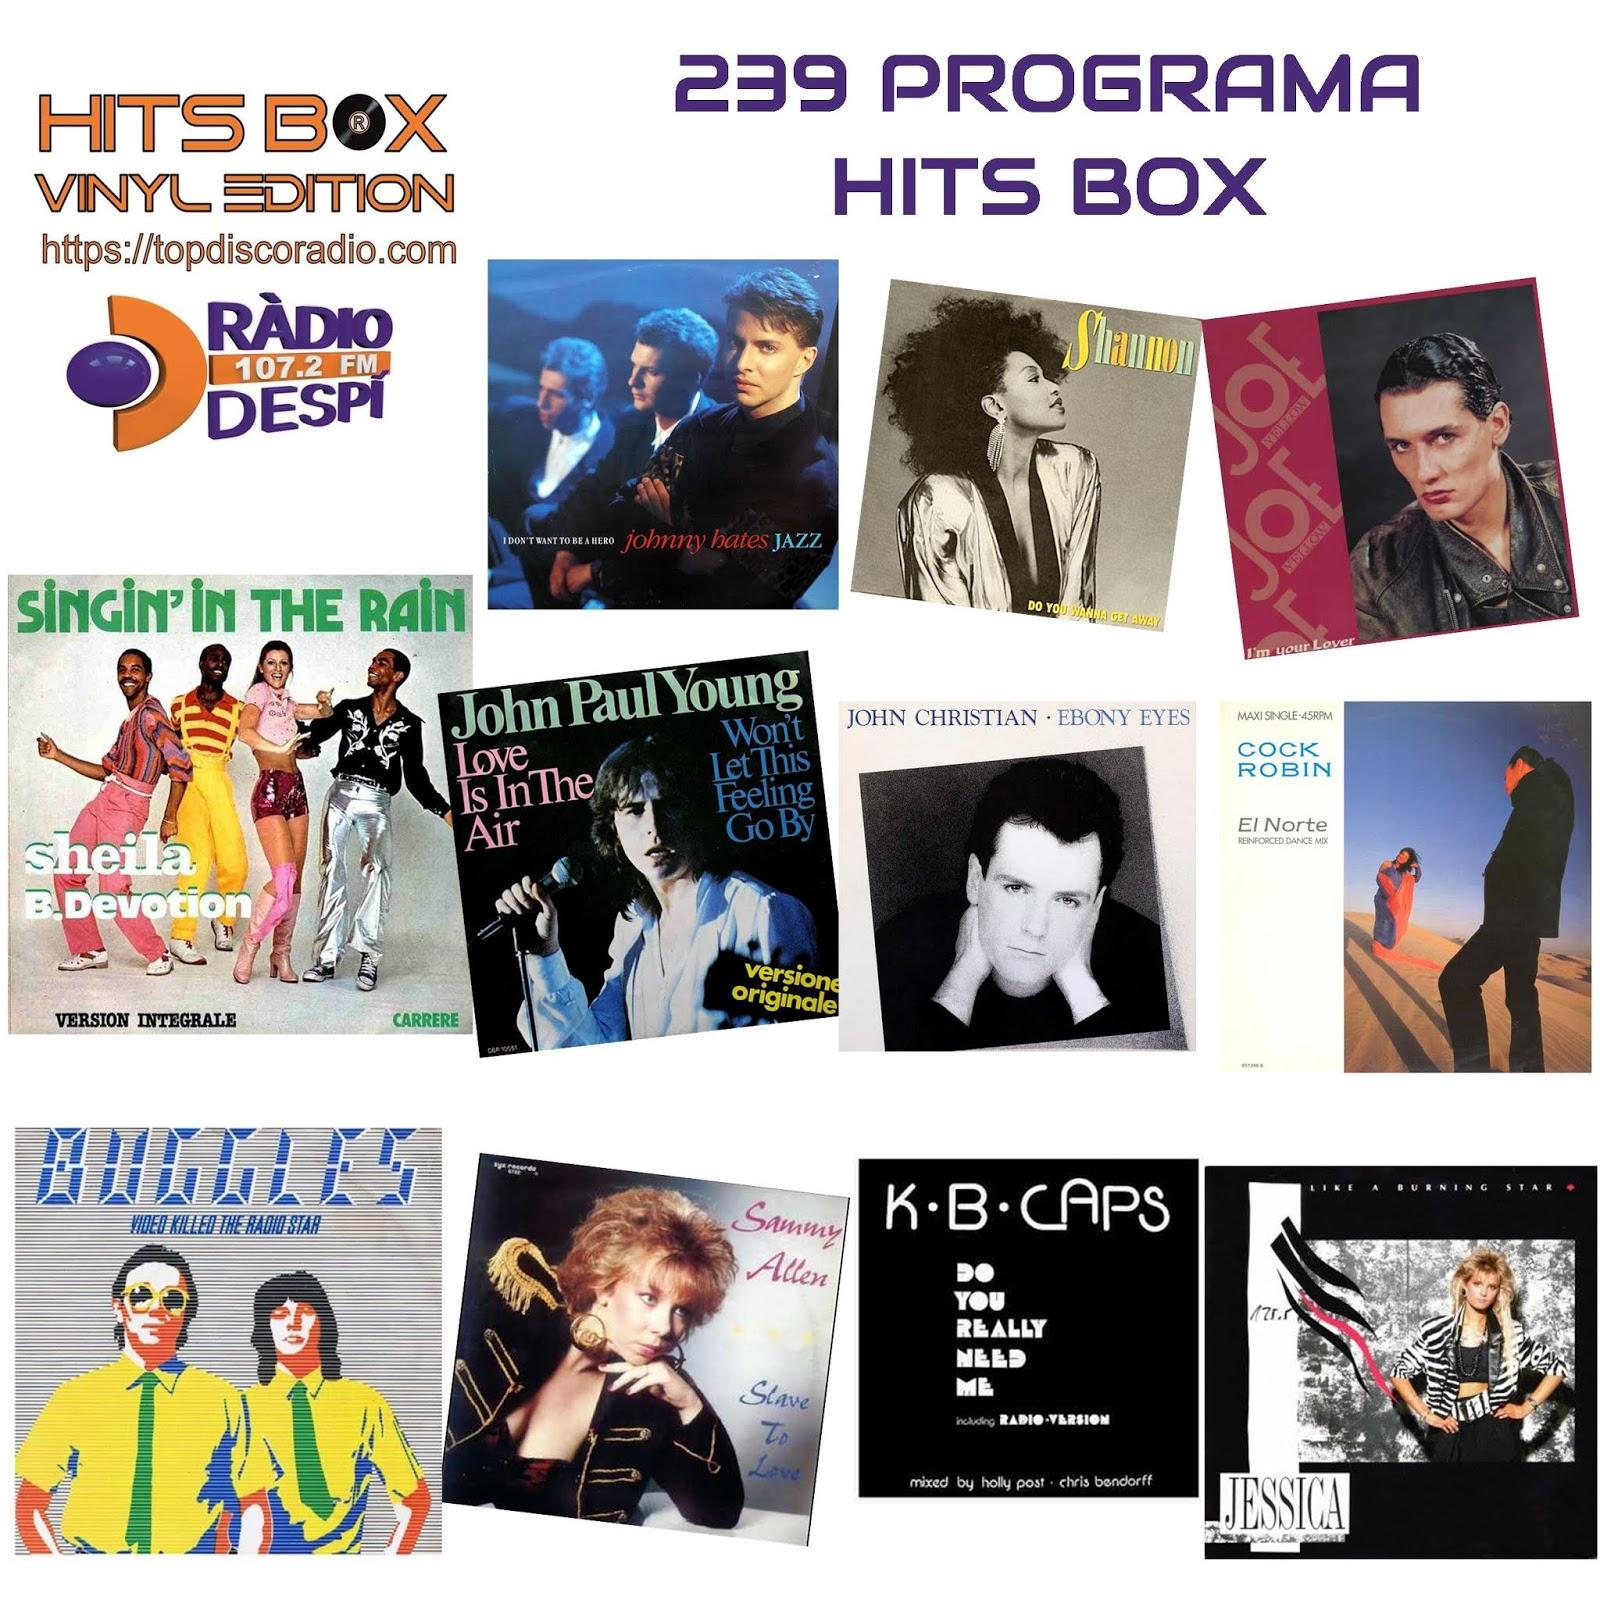 238 Programa Hits Box